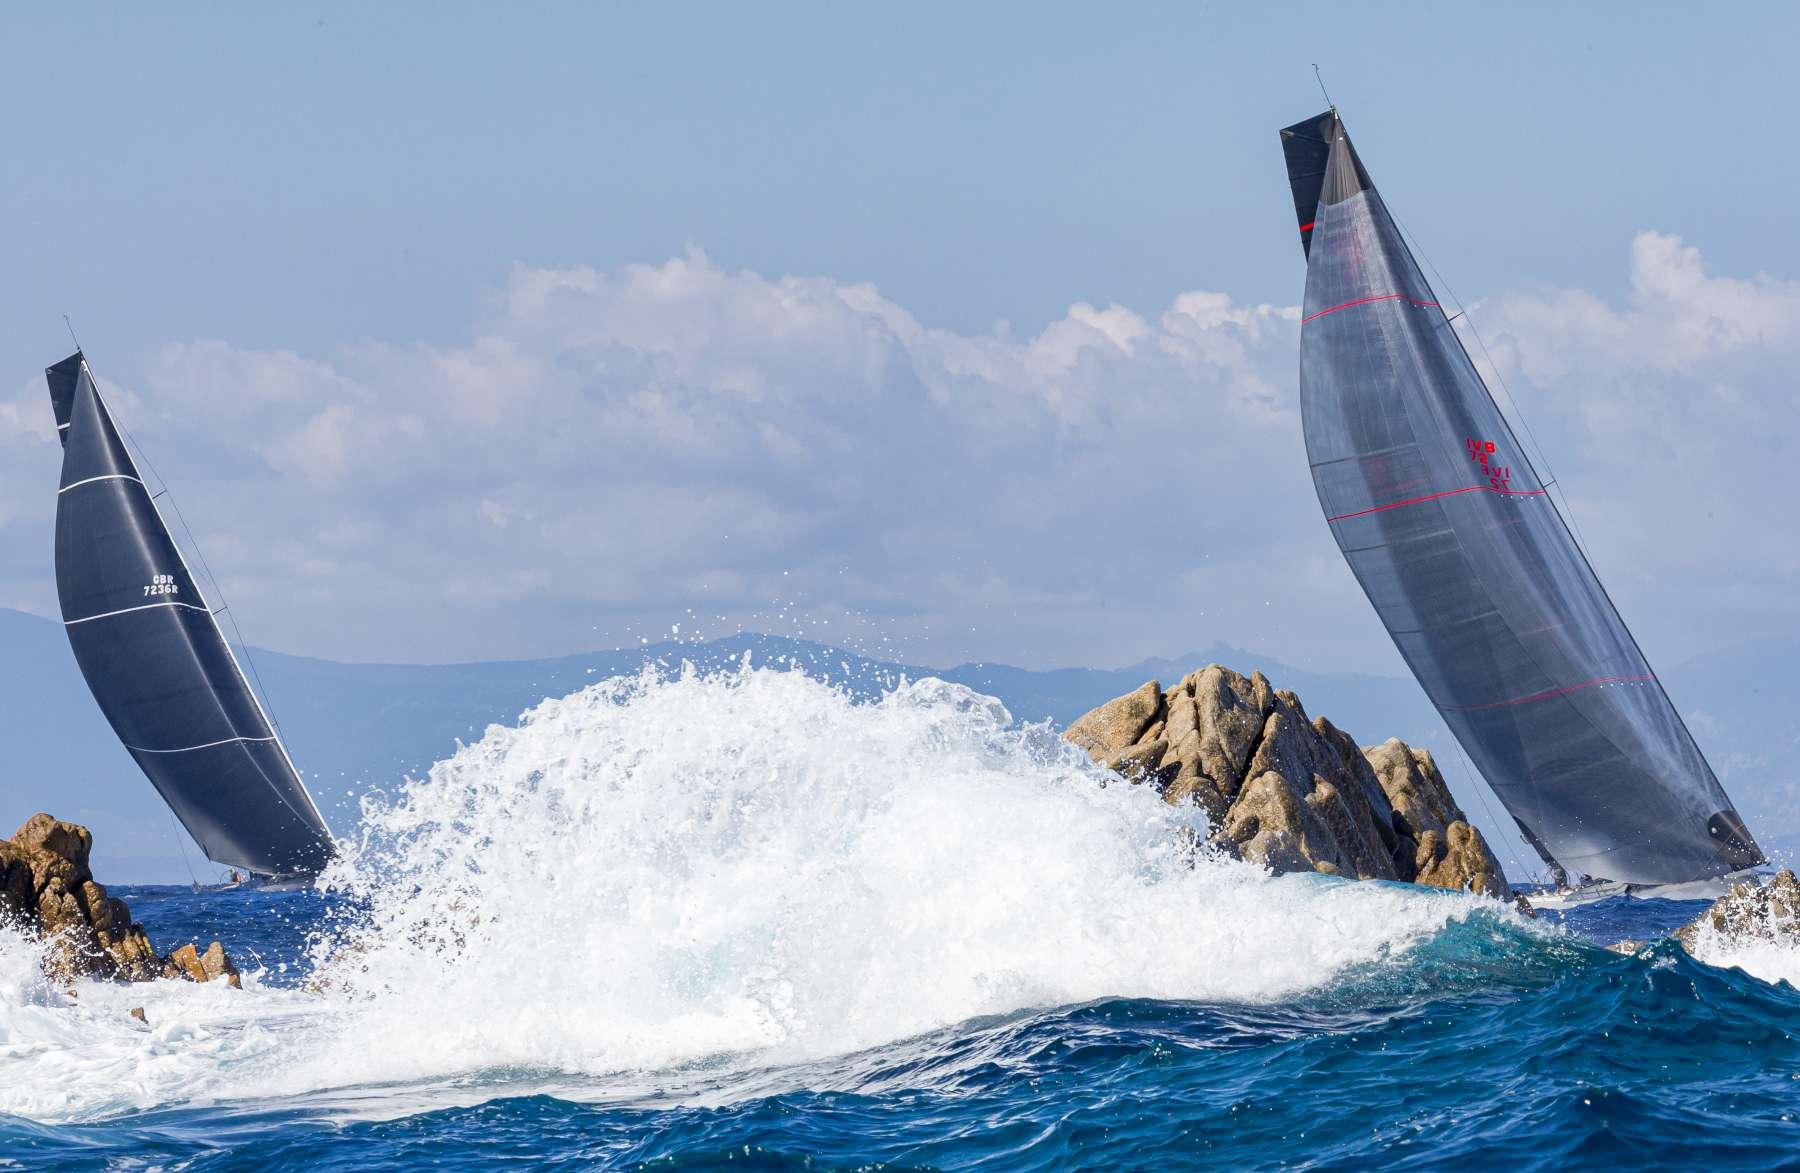 MAXI YACHT ROLEX CUP 2019 - FOTO DAY 3 ONLINE - NEWS - Yacht Club Costa Smeralda